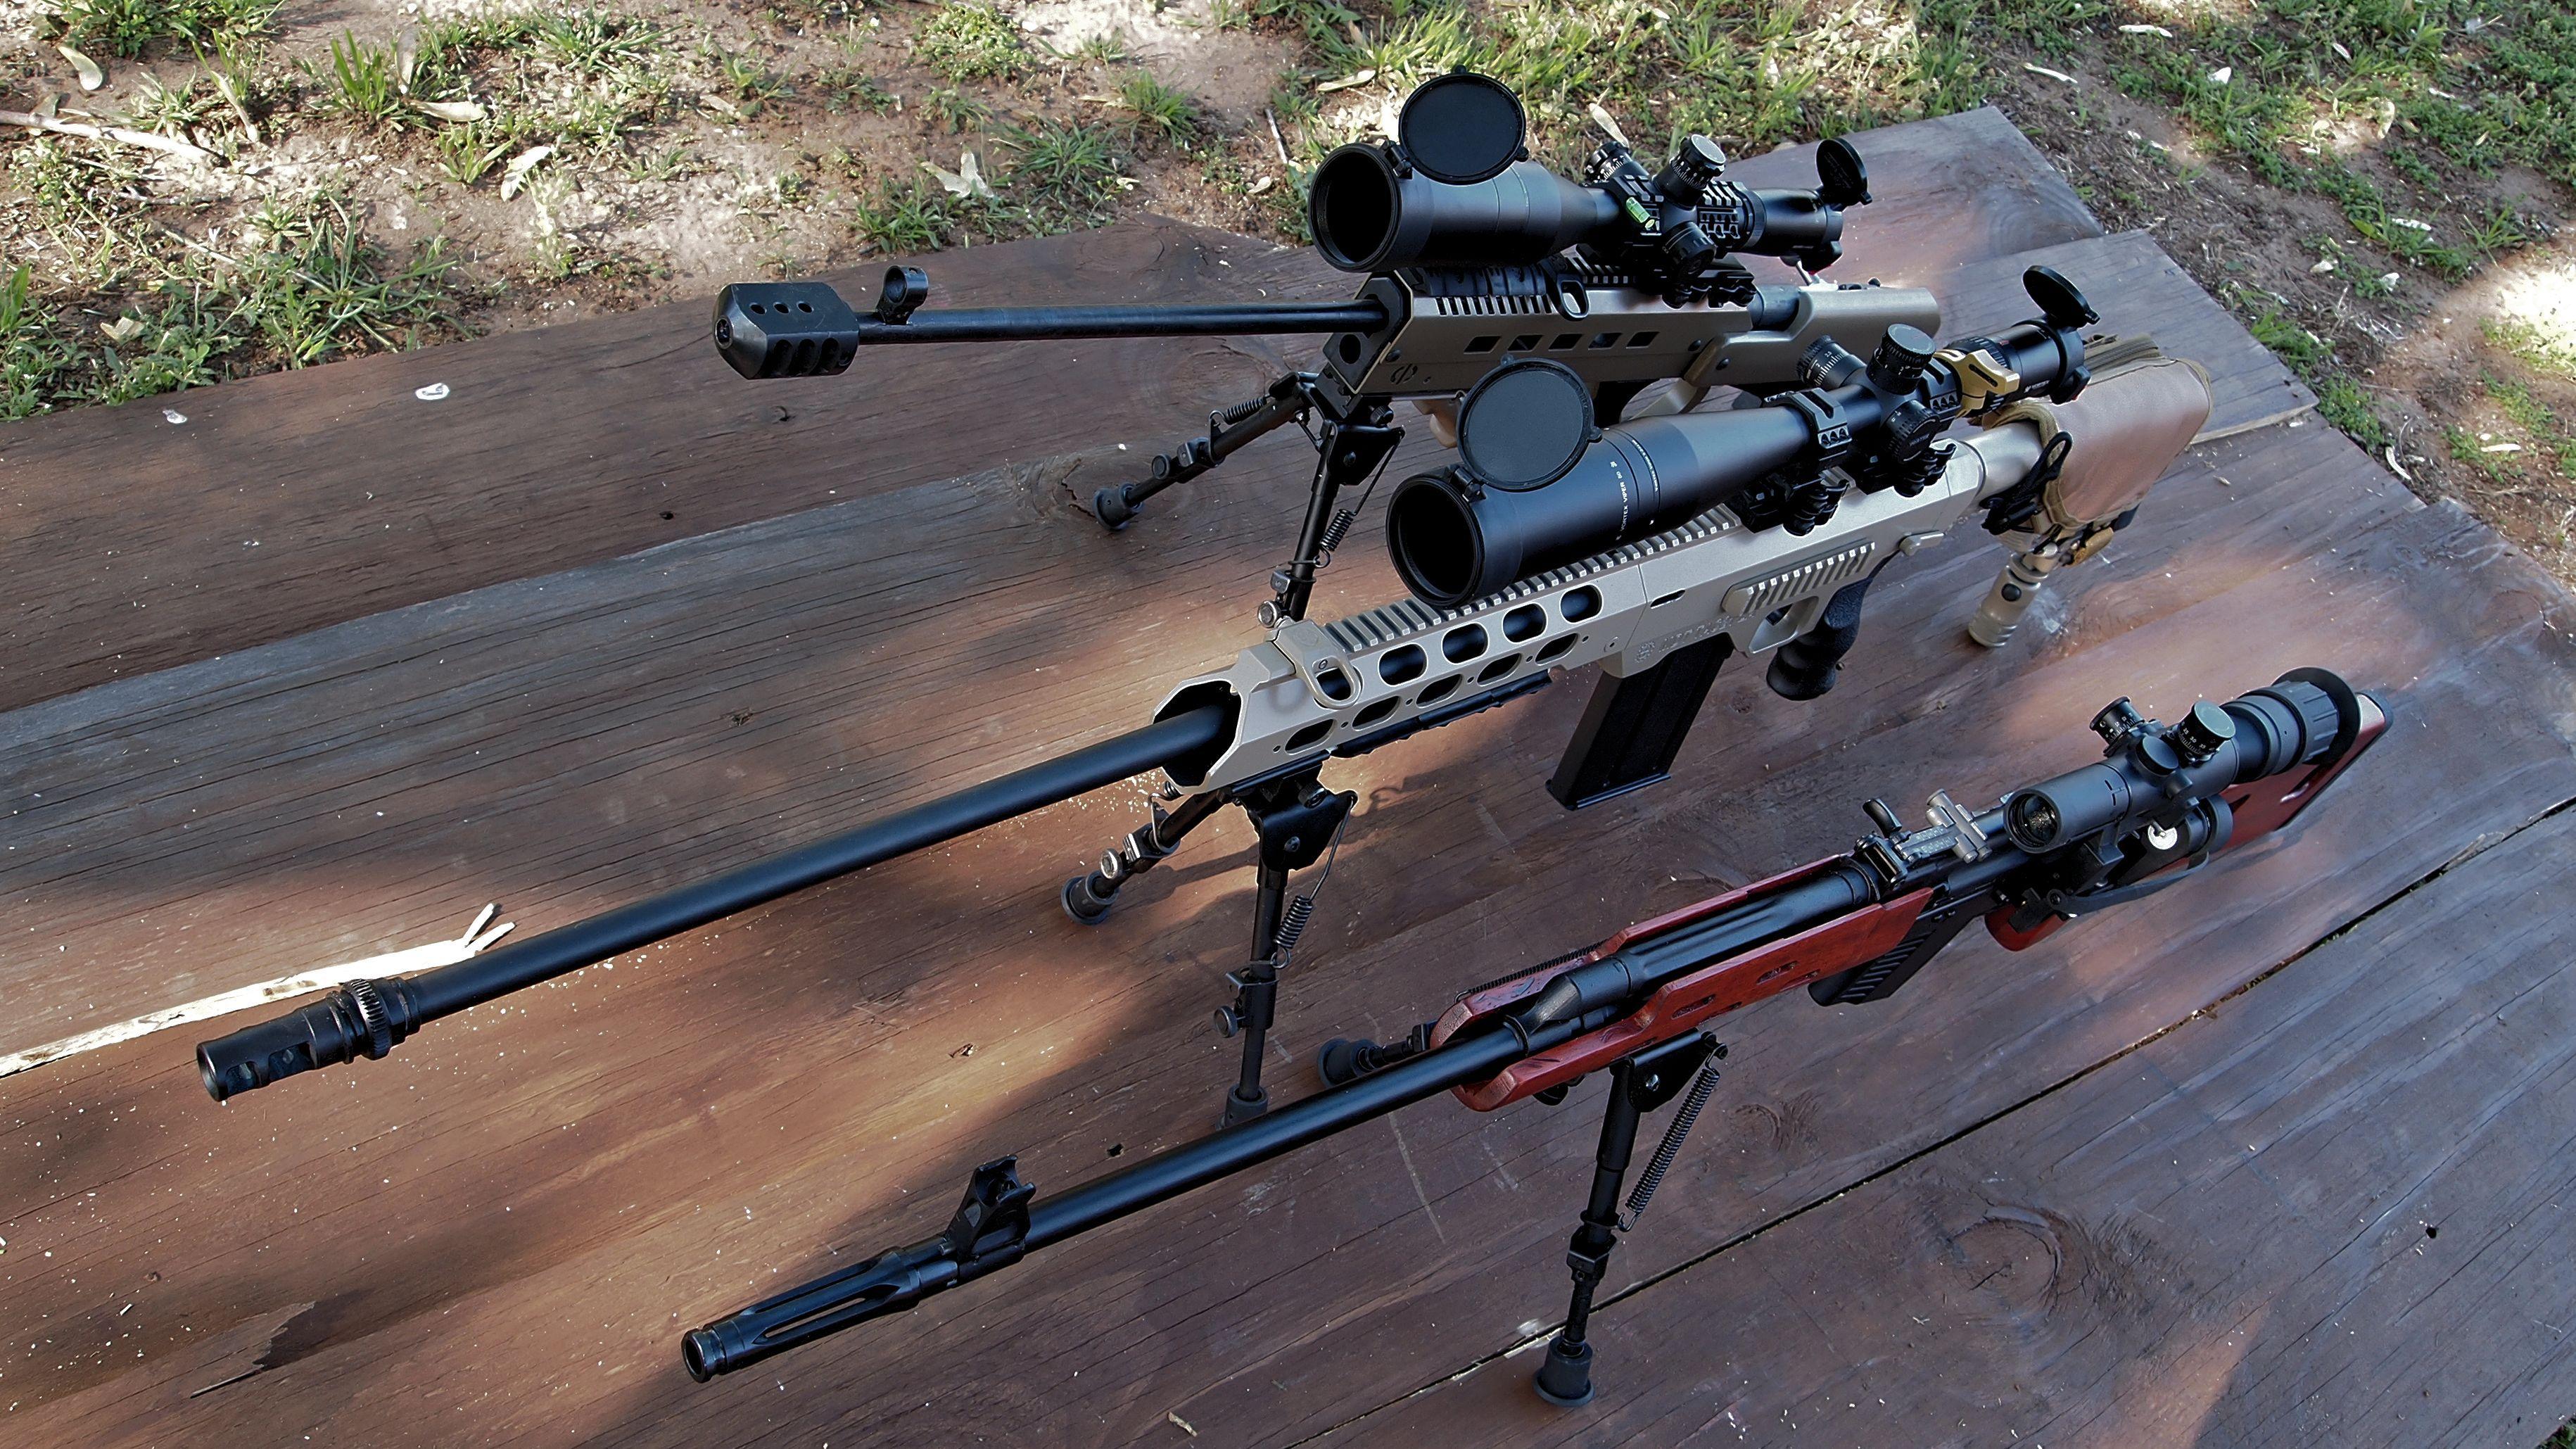 Reapers Trinity #2. 2 DMRs and 1 PSR. #cbrps #remington700 #762x54r #vepr #molot #mdt #300wm #tabuk #posp #psop #mosin #mosinnagant #9130 #dmr #sniper #svd #dragunov #accuracy1st #300WinMag #922rCompliant #DMR #rifle #rhinelandarms #tapco #carolinashooterssupply #csstabuk #tabuk #russian